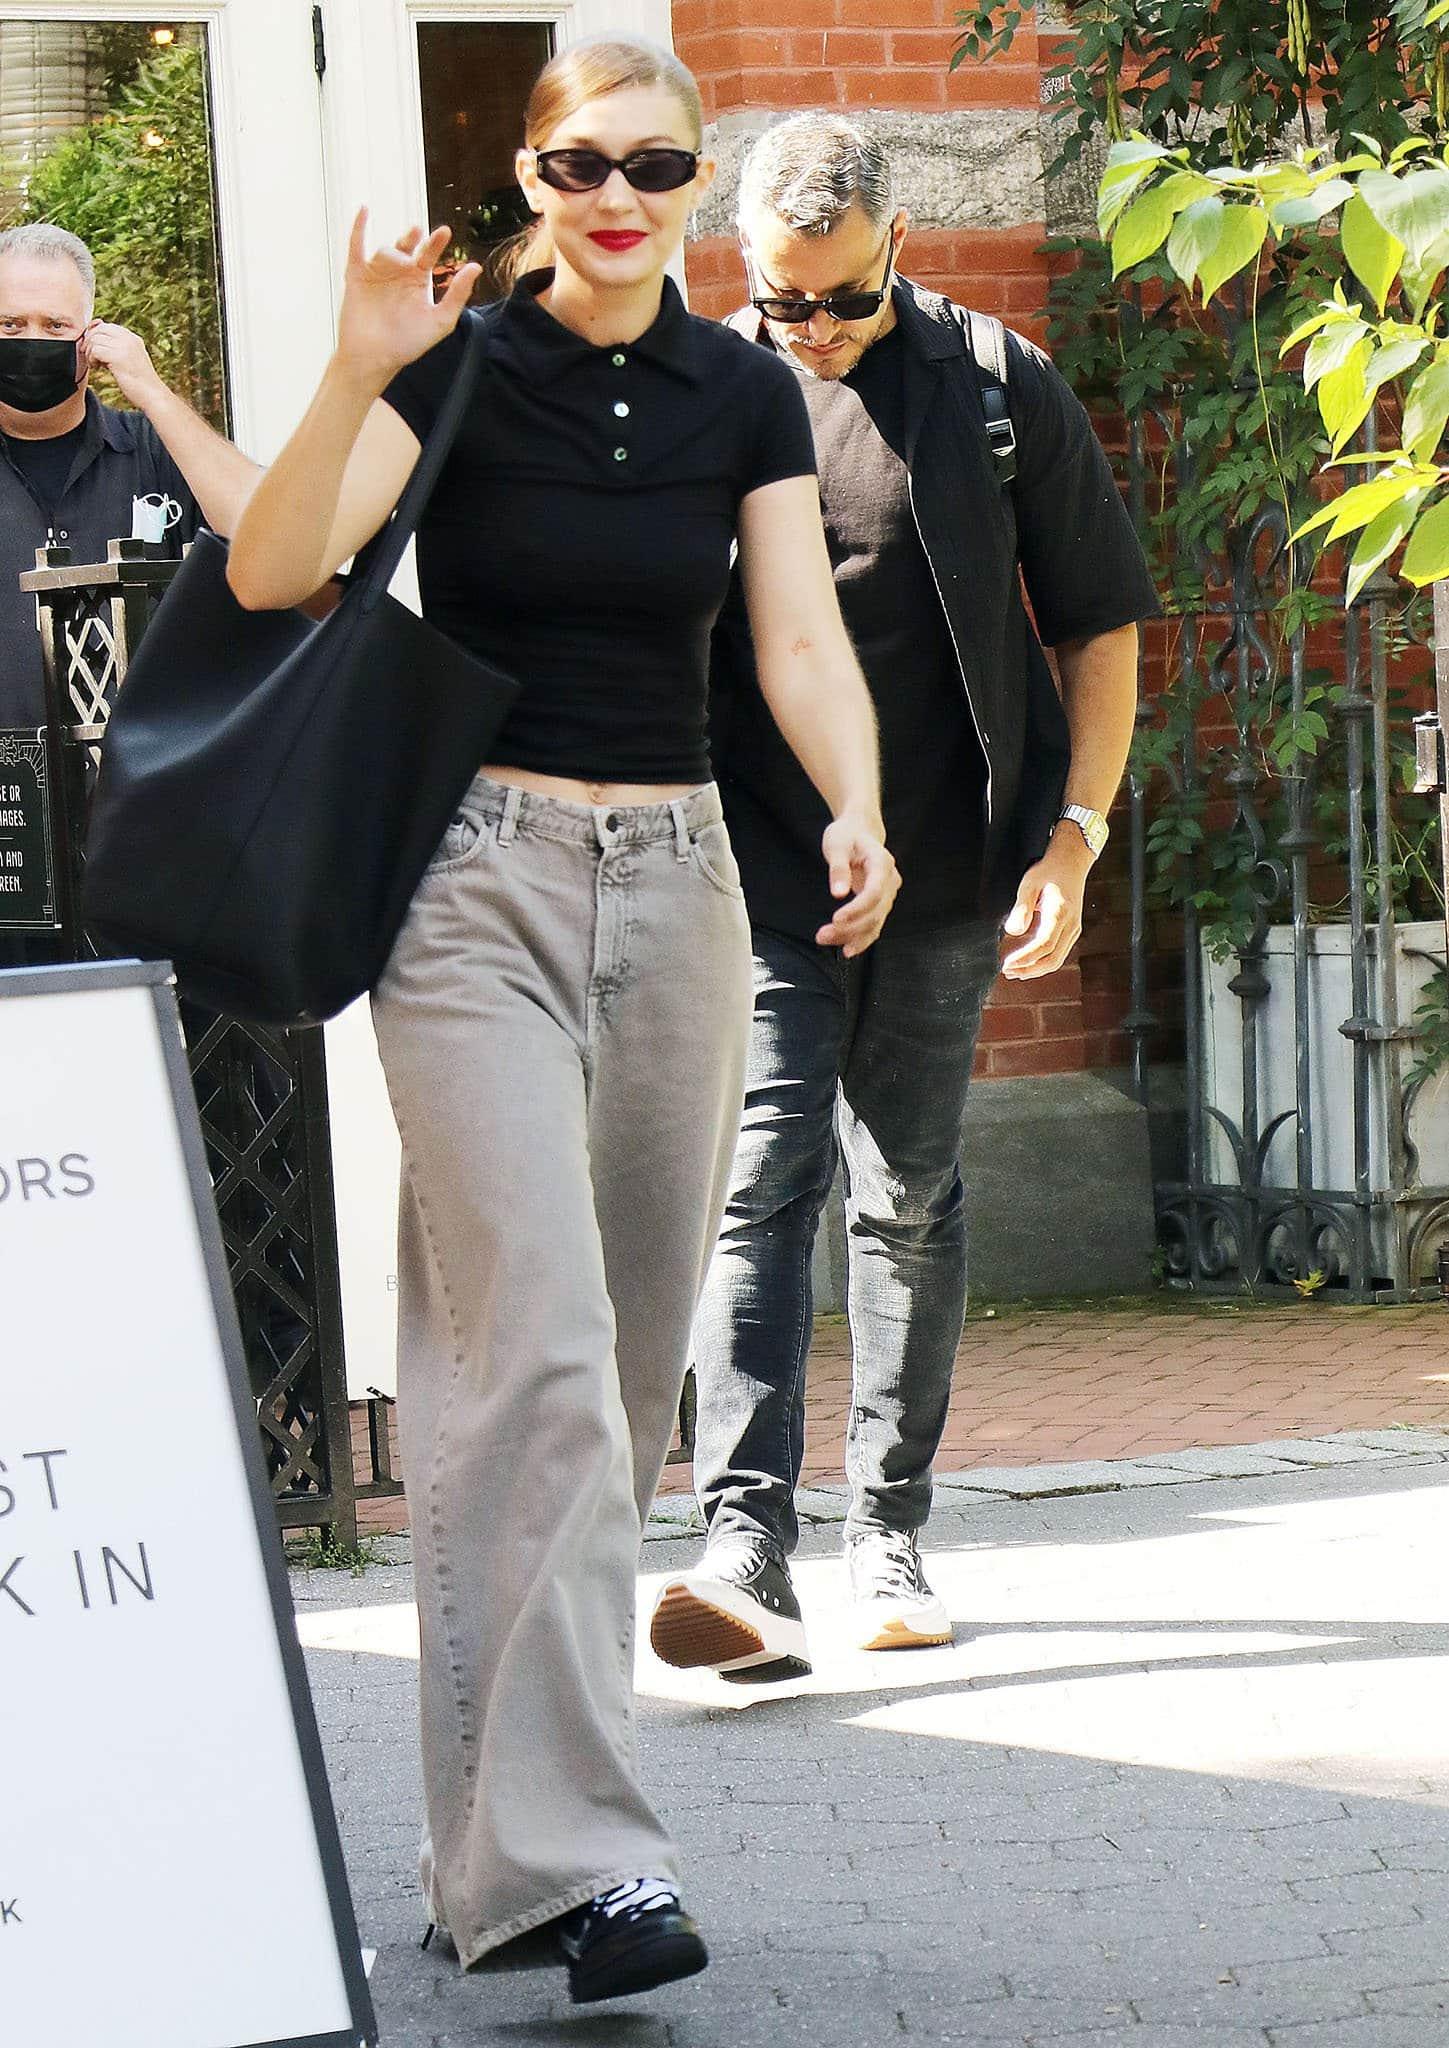 Gigi Hadid teams a casual Bleu Salt polo shirt with The Row jeans outside Michael Kors' NYFW show at Tavern On The Green on September 10, 2021